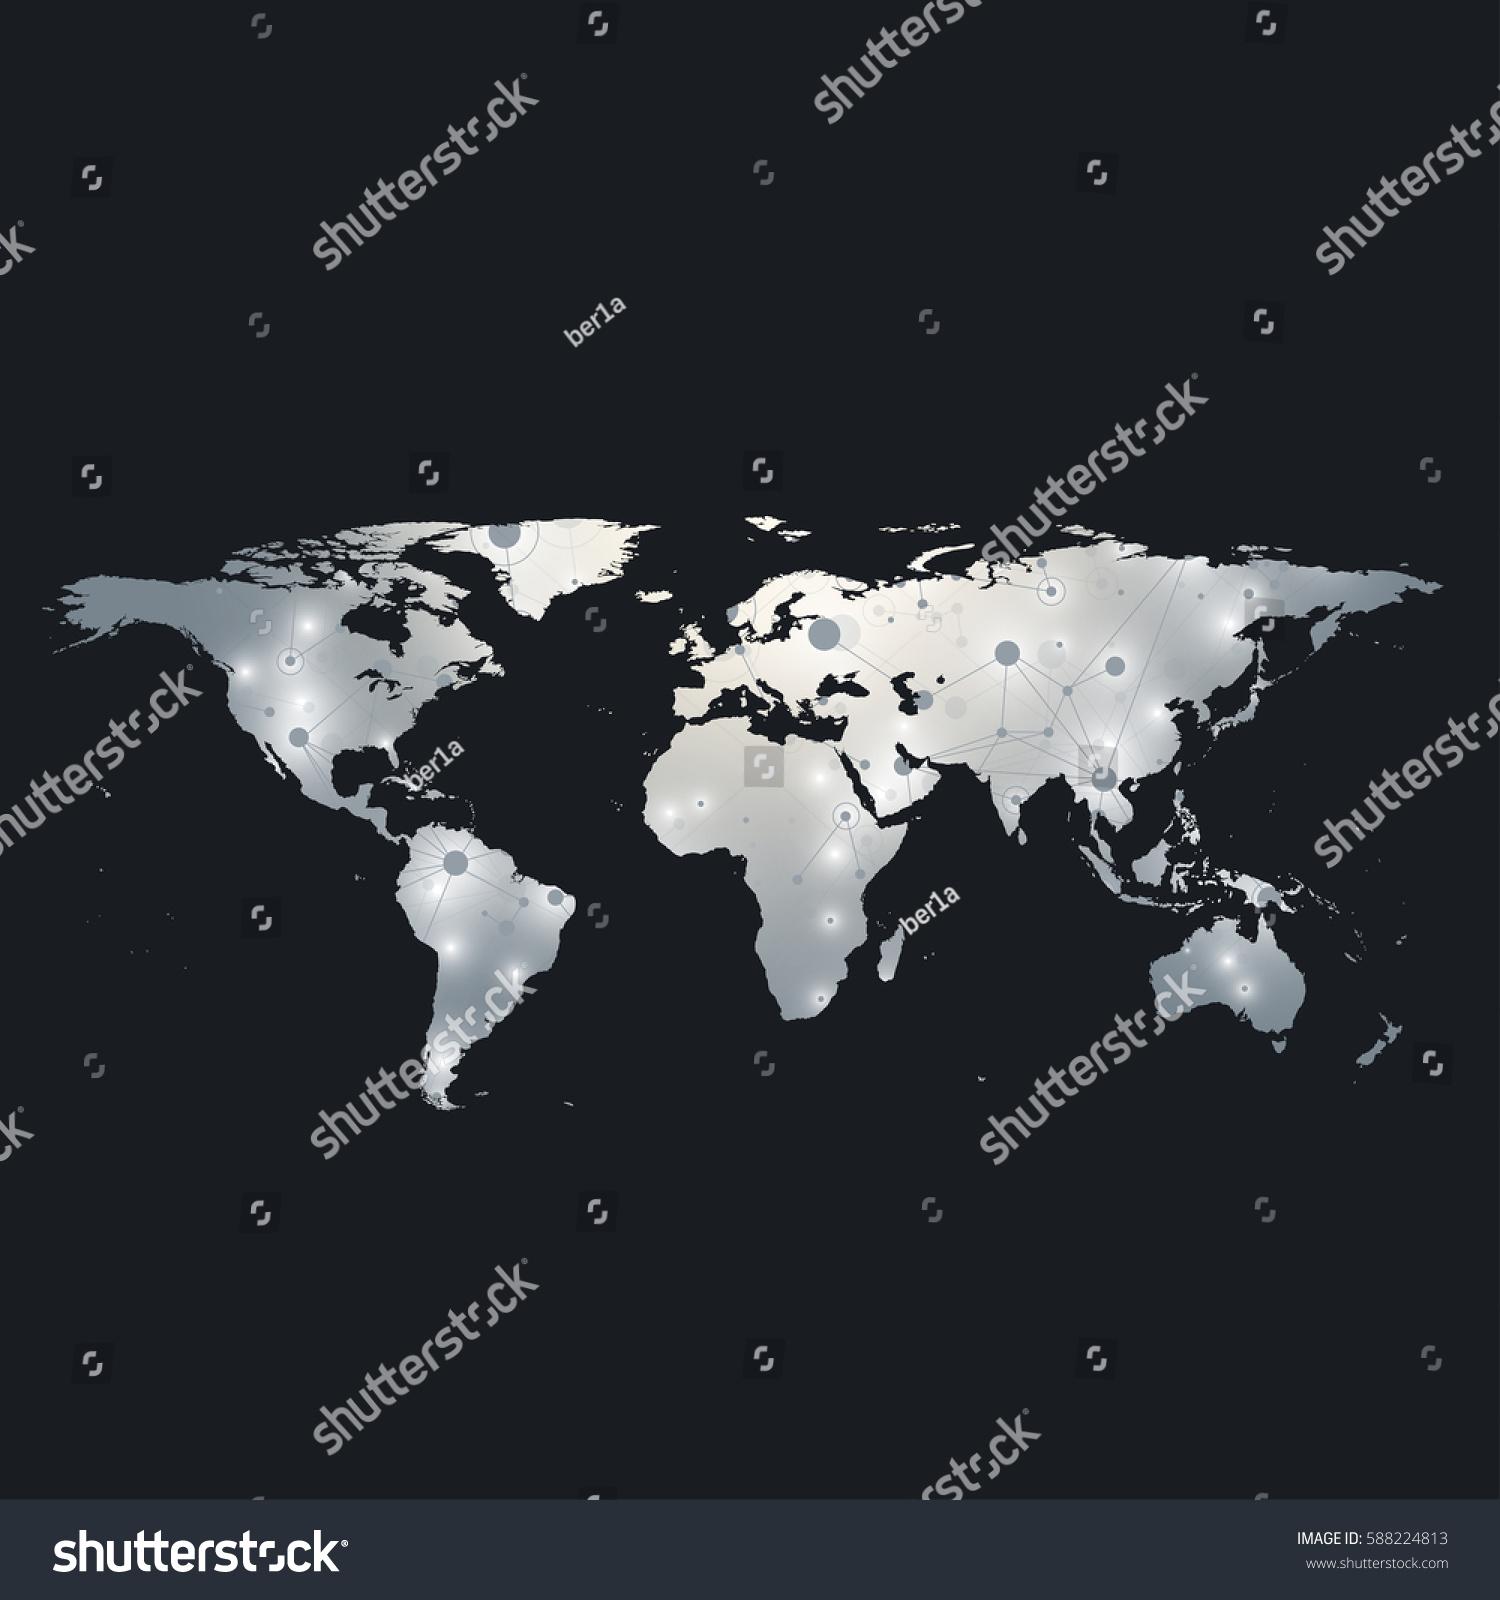 Political world map global technology networking stock vector political world map global technology networking stock vector 588224813 shutterstock gumiabroncs Choice Image